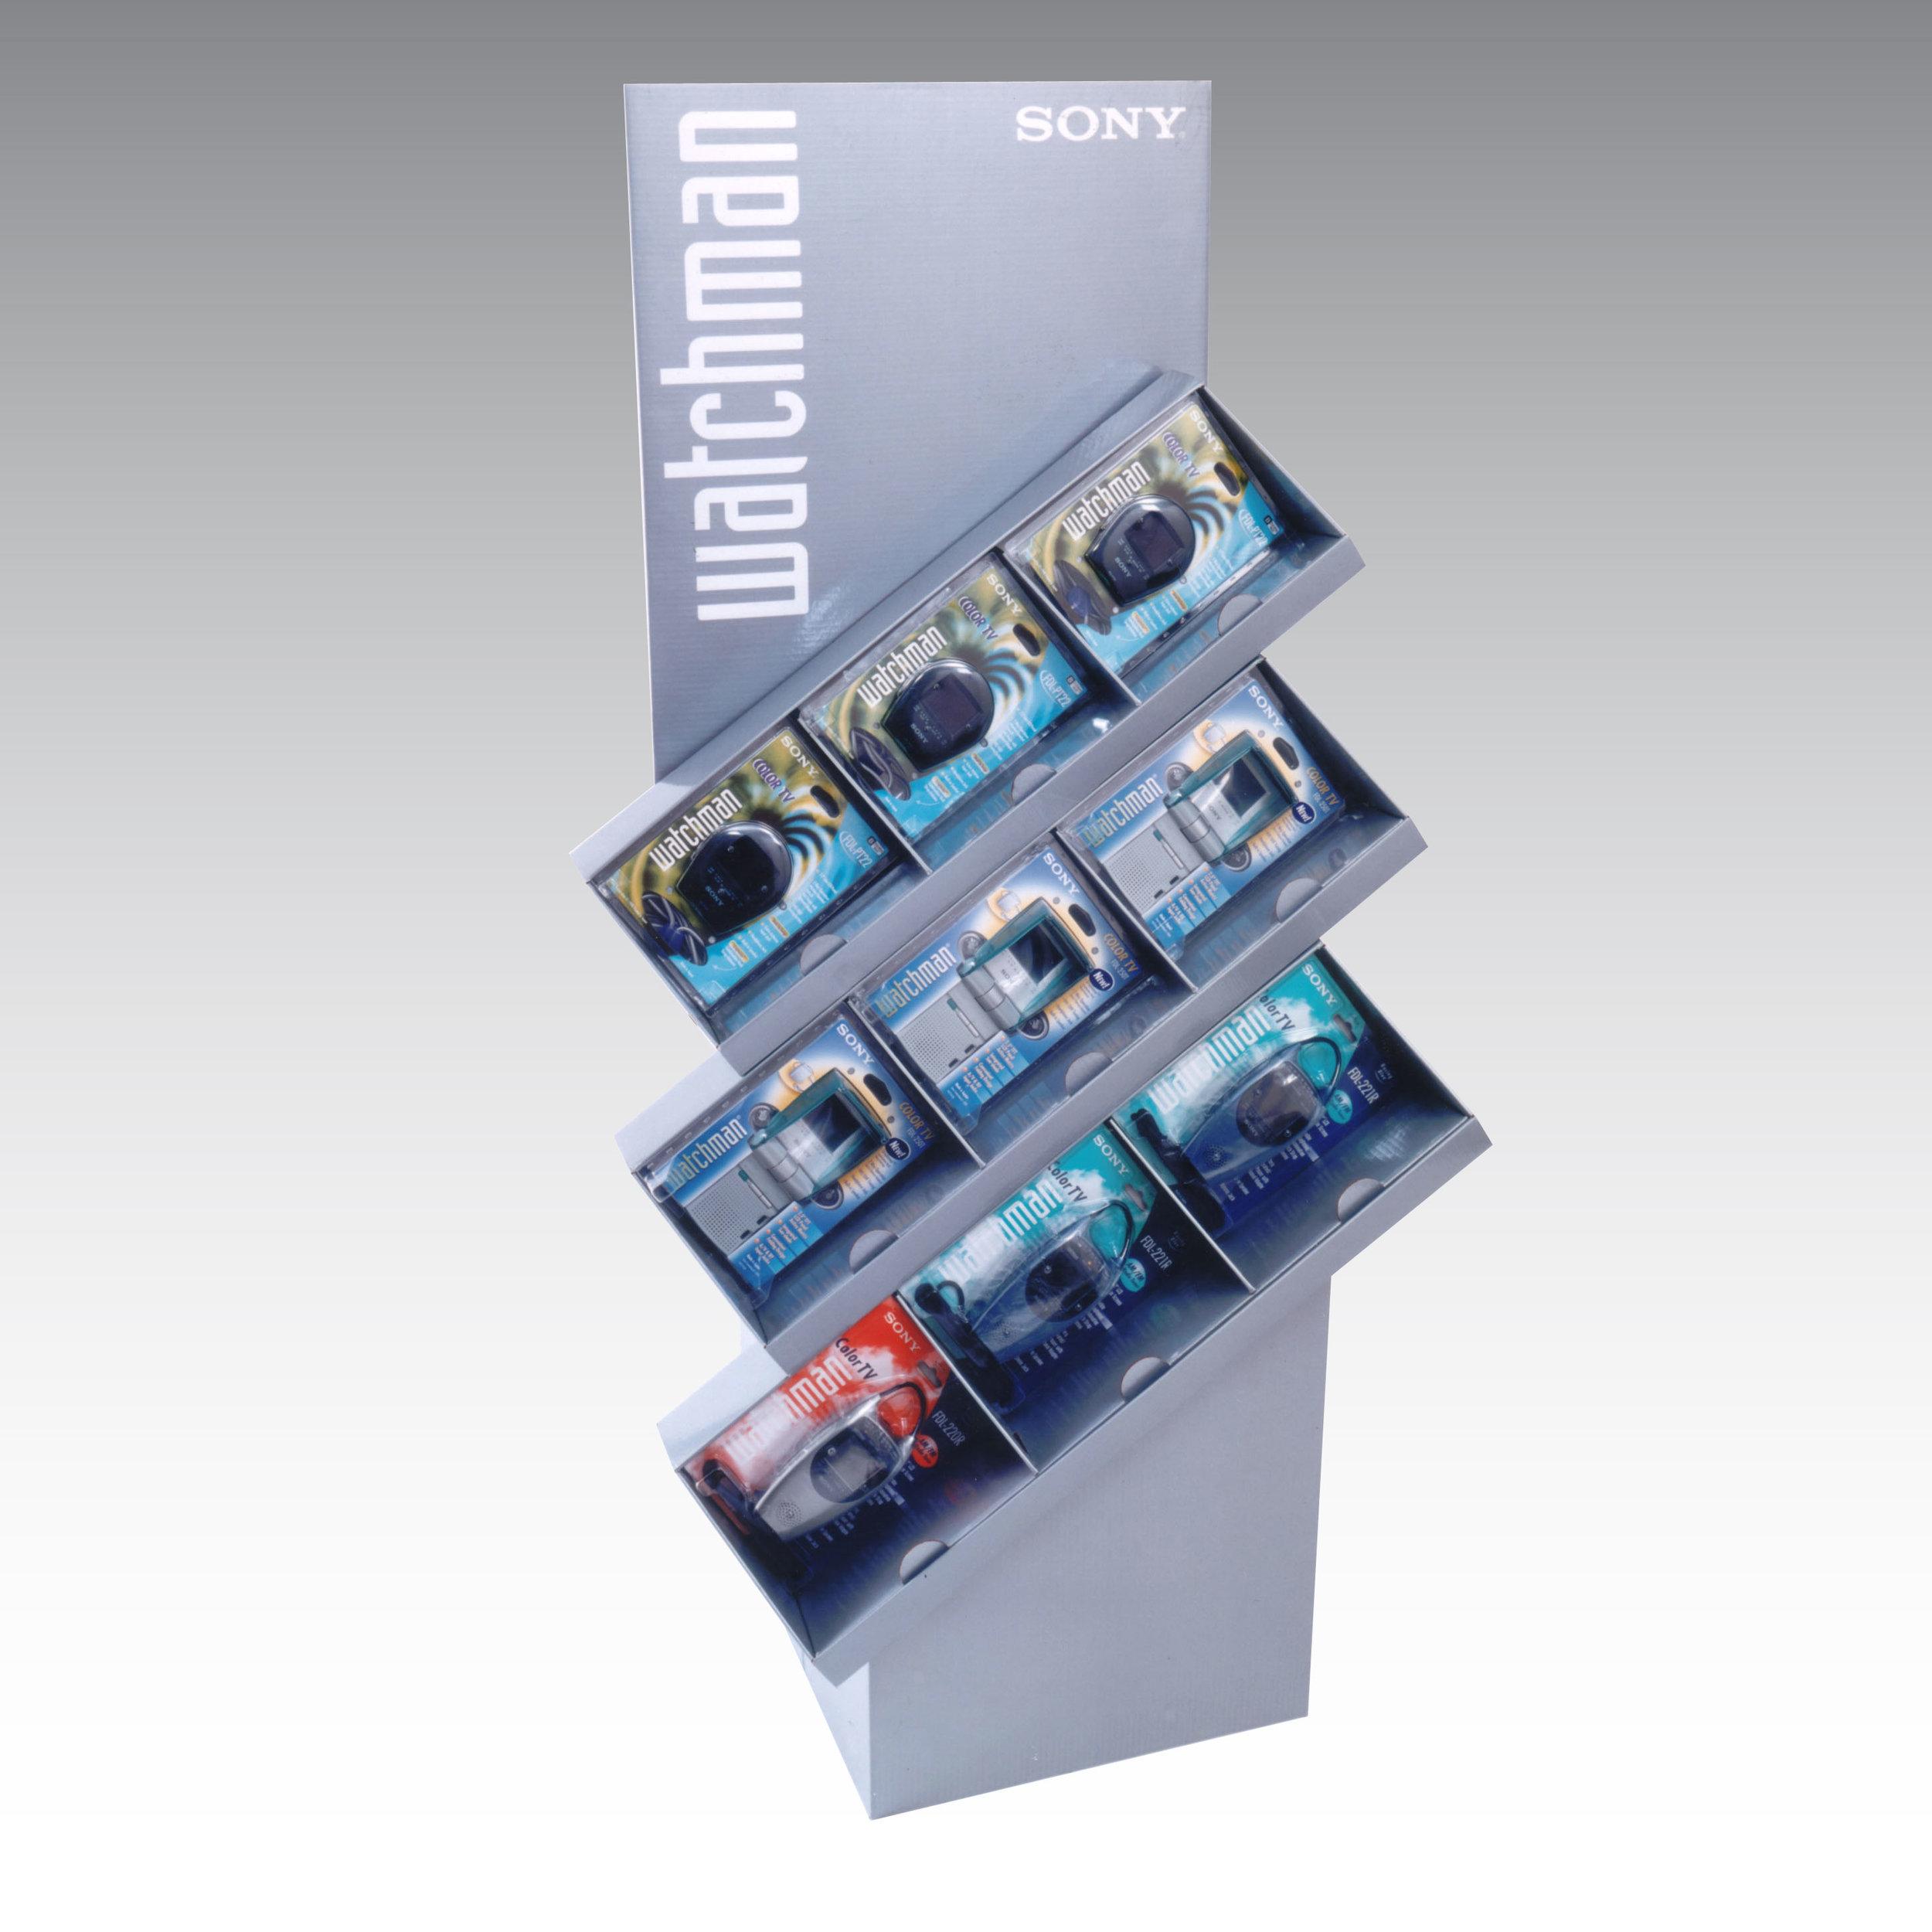 Sony Watchman display - Popai OMA award -